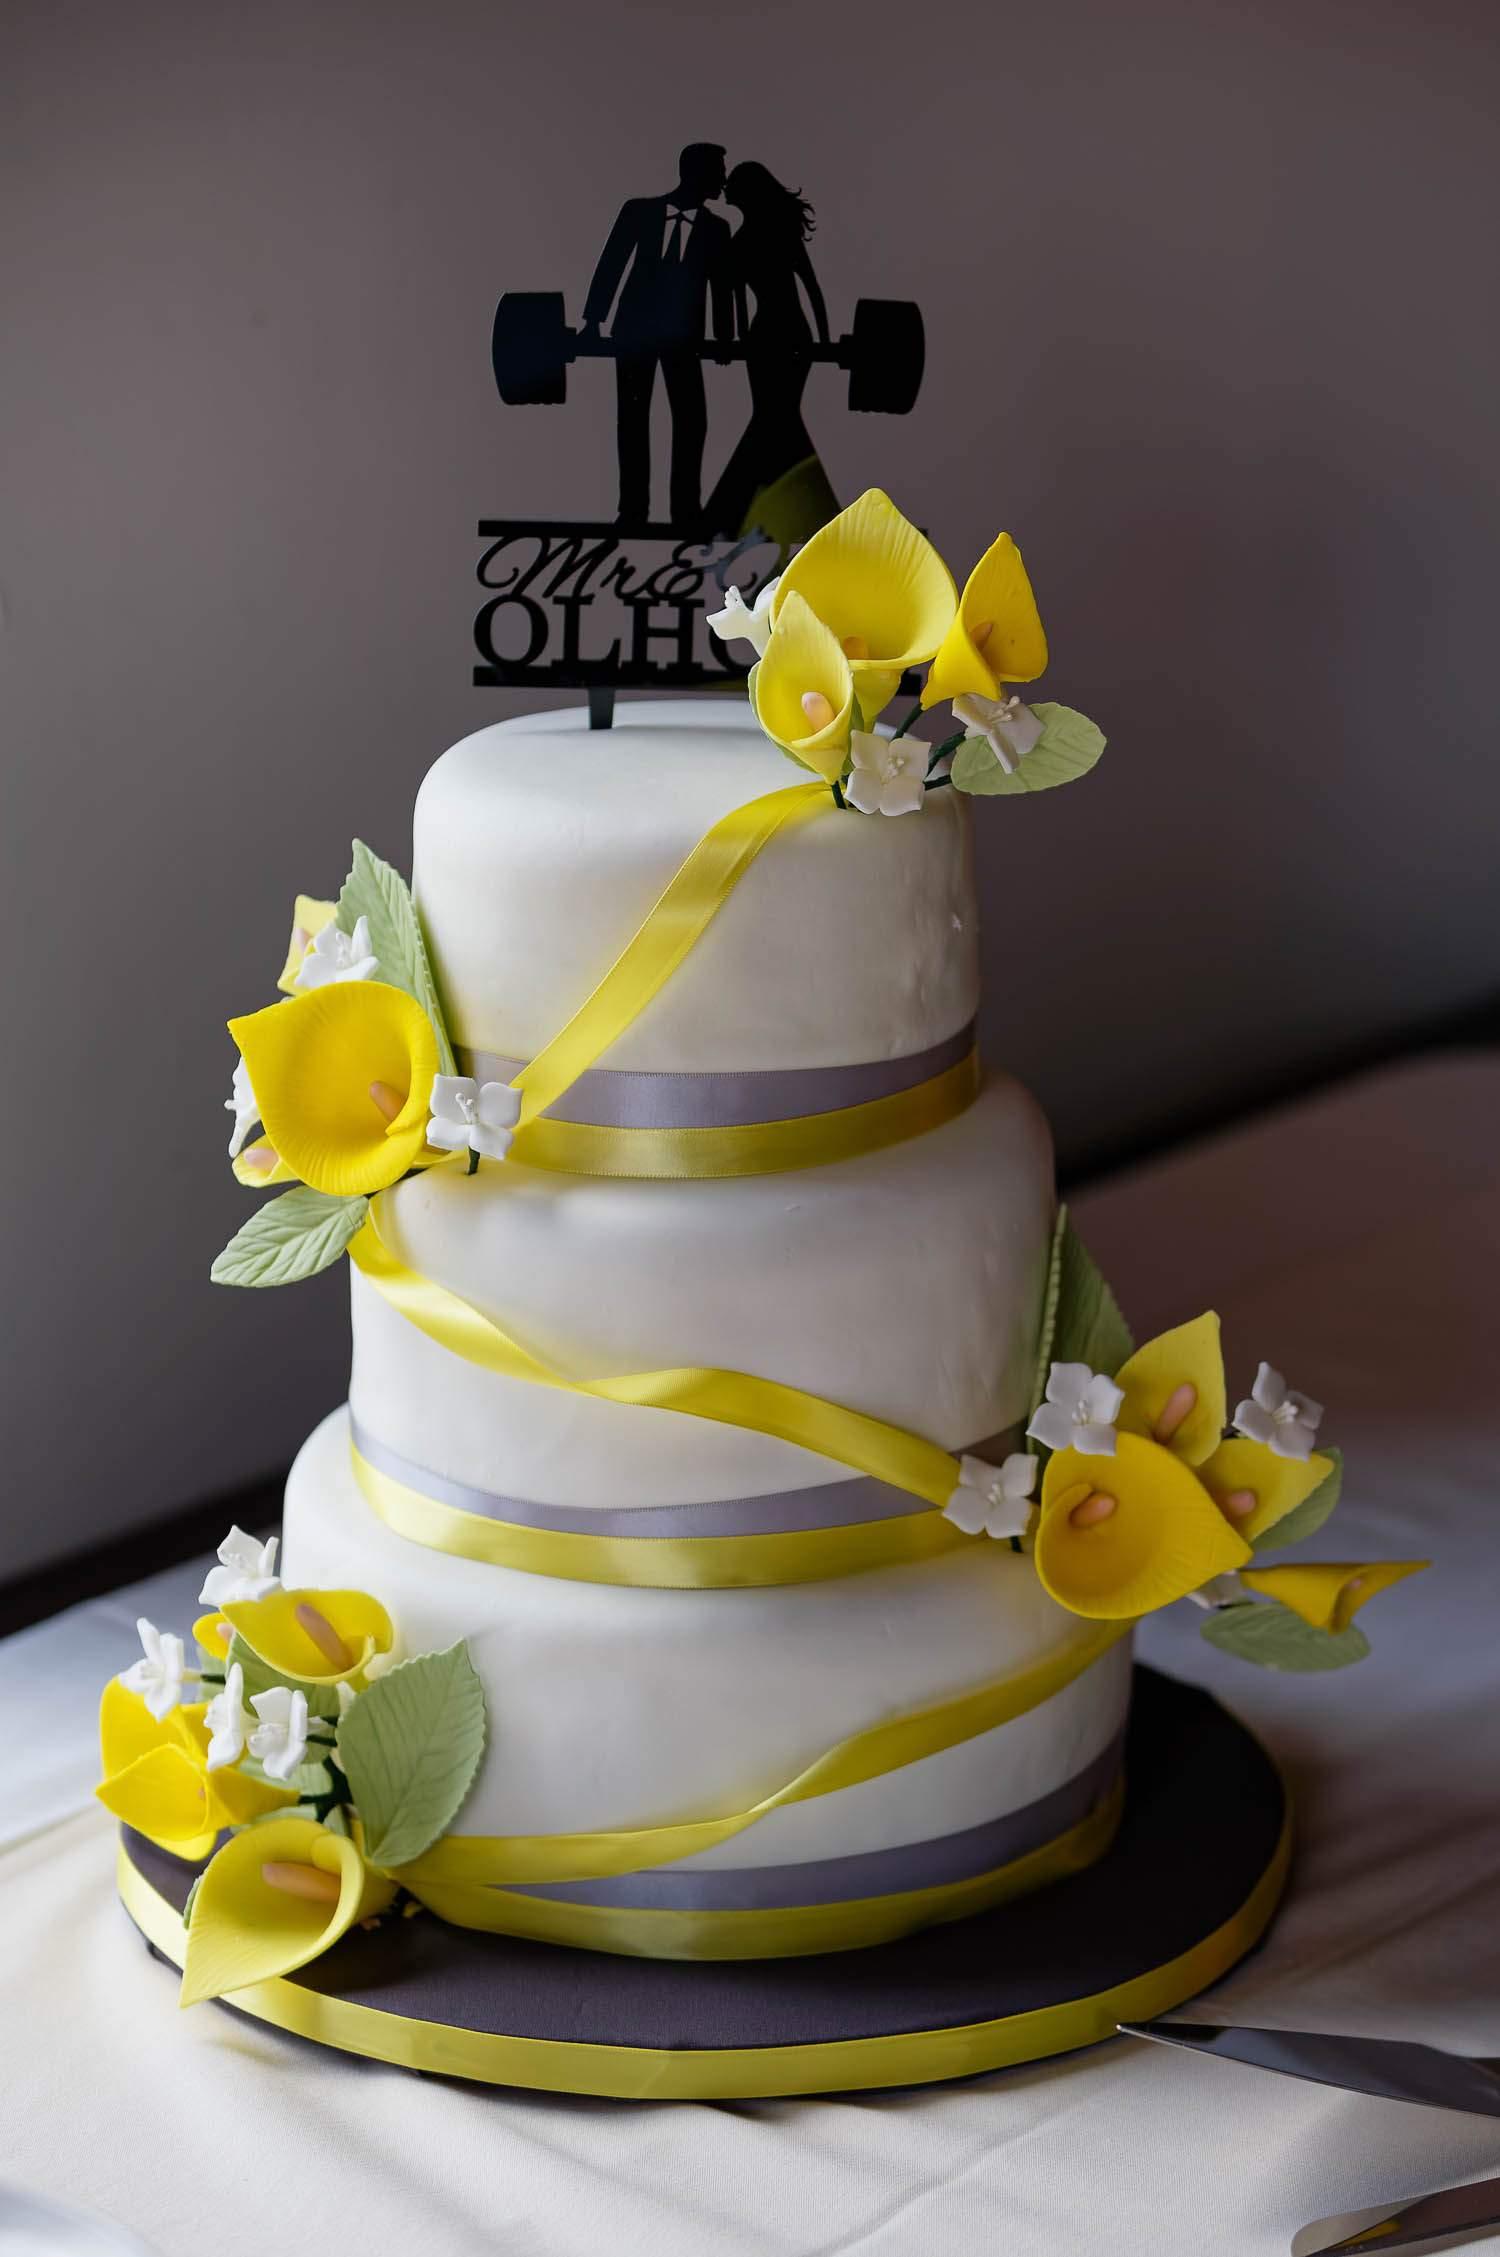 silhouette cake top